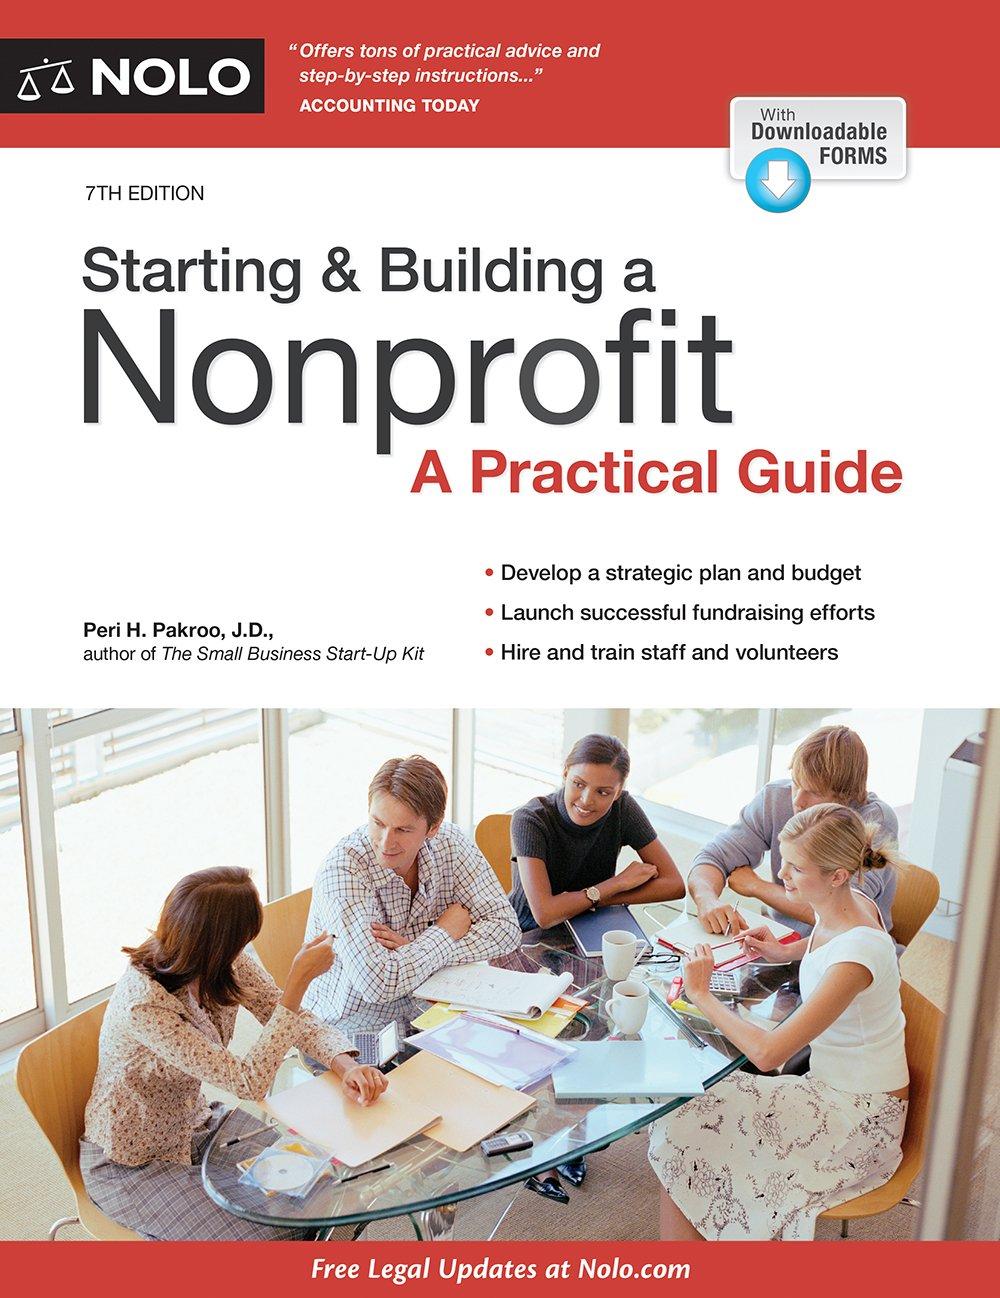 Starting & Building a Nonprofit: A Practical Guide: Peri Pakroo J.D.:  9781413323573: Amazon.com: Books